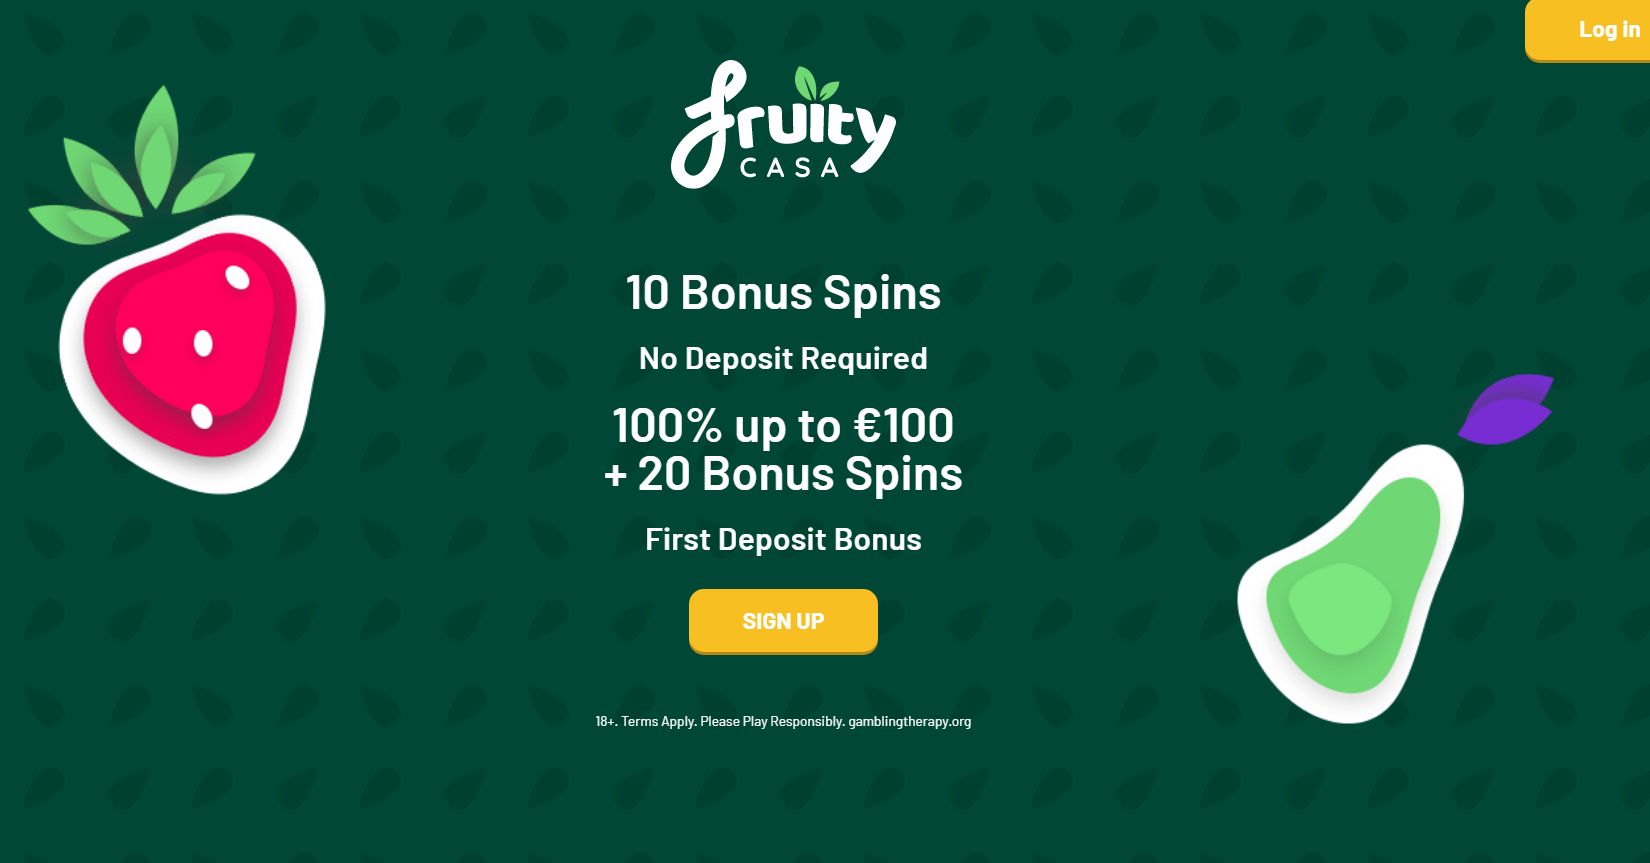 Fruity Casa Casino Bonus Codes 2021